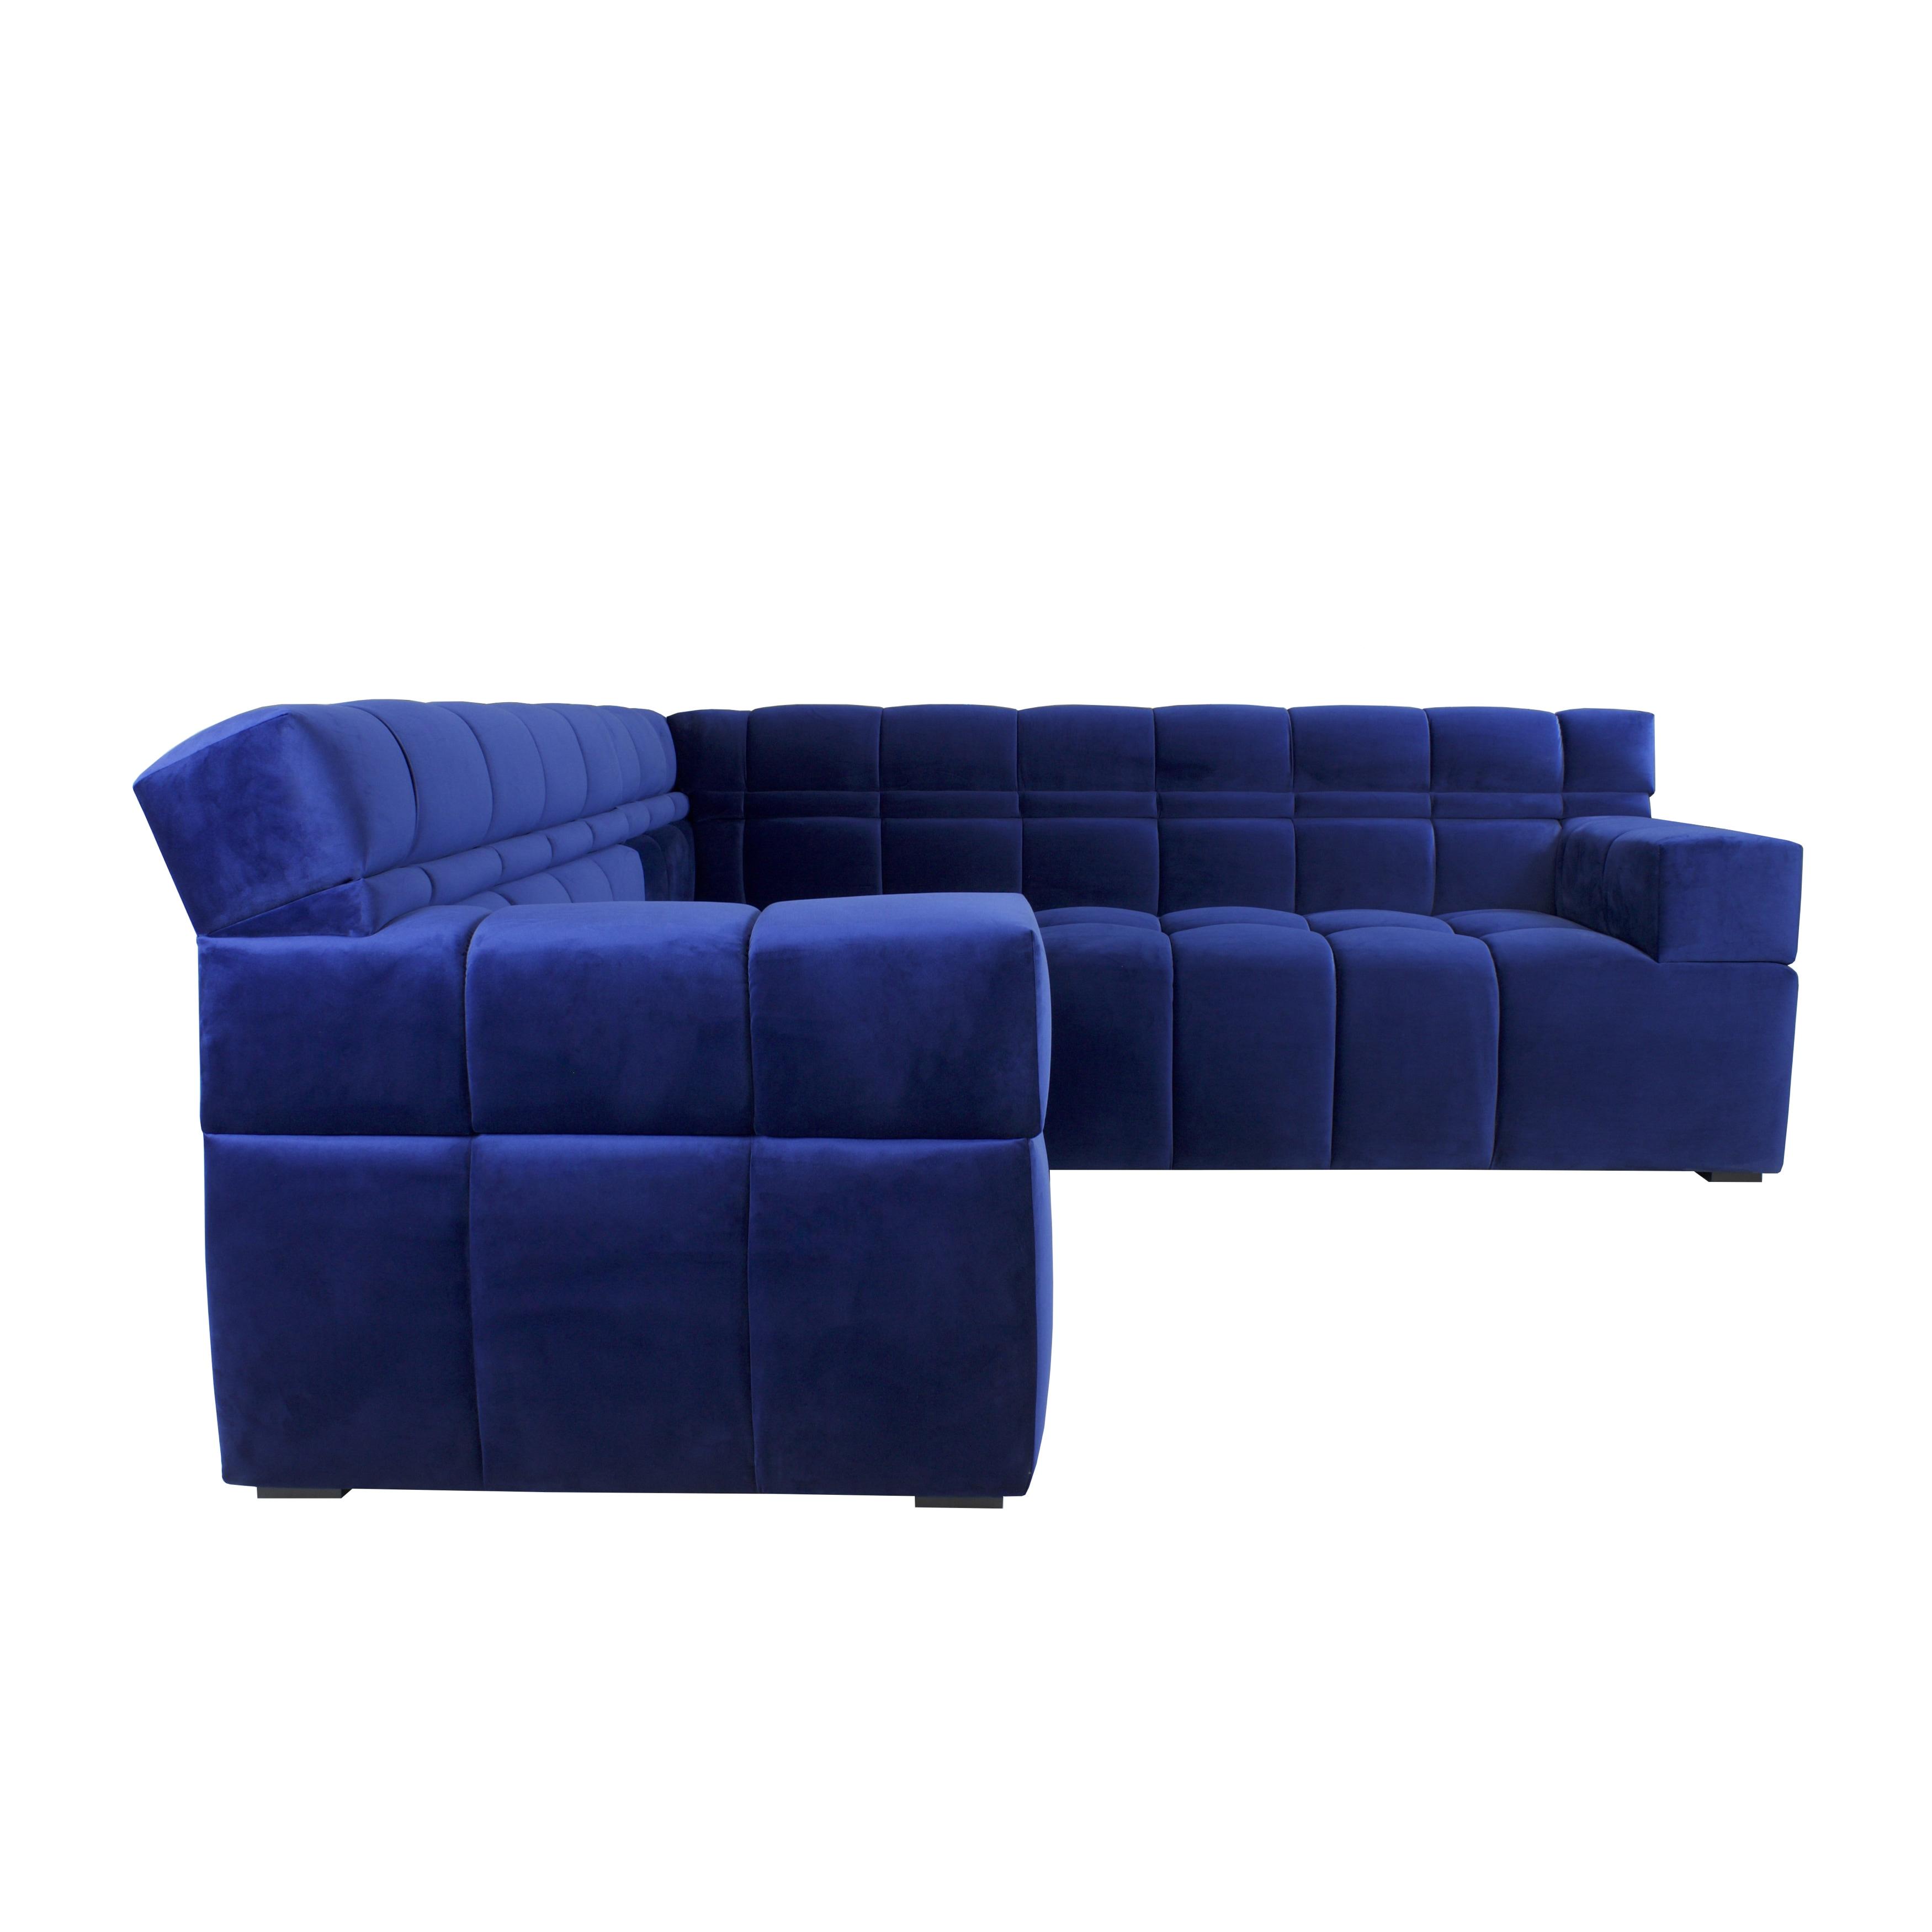 jar designs furniture. JAR Designs \u0027Boxter\u0027 Velvet 2-piece Sectional Sofa - Free Shipping Today Overstock.com 20351690 Jar Furniture F